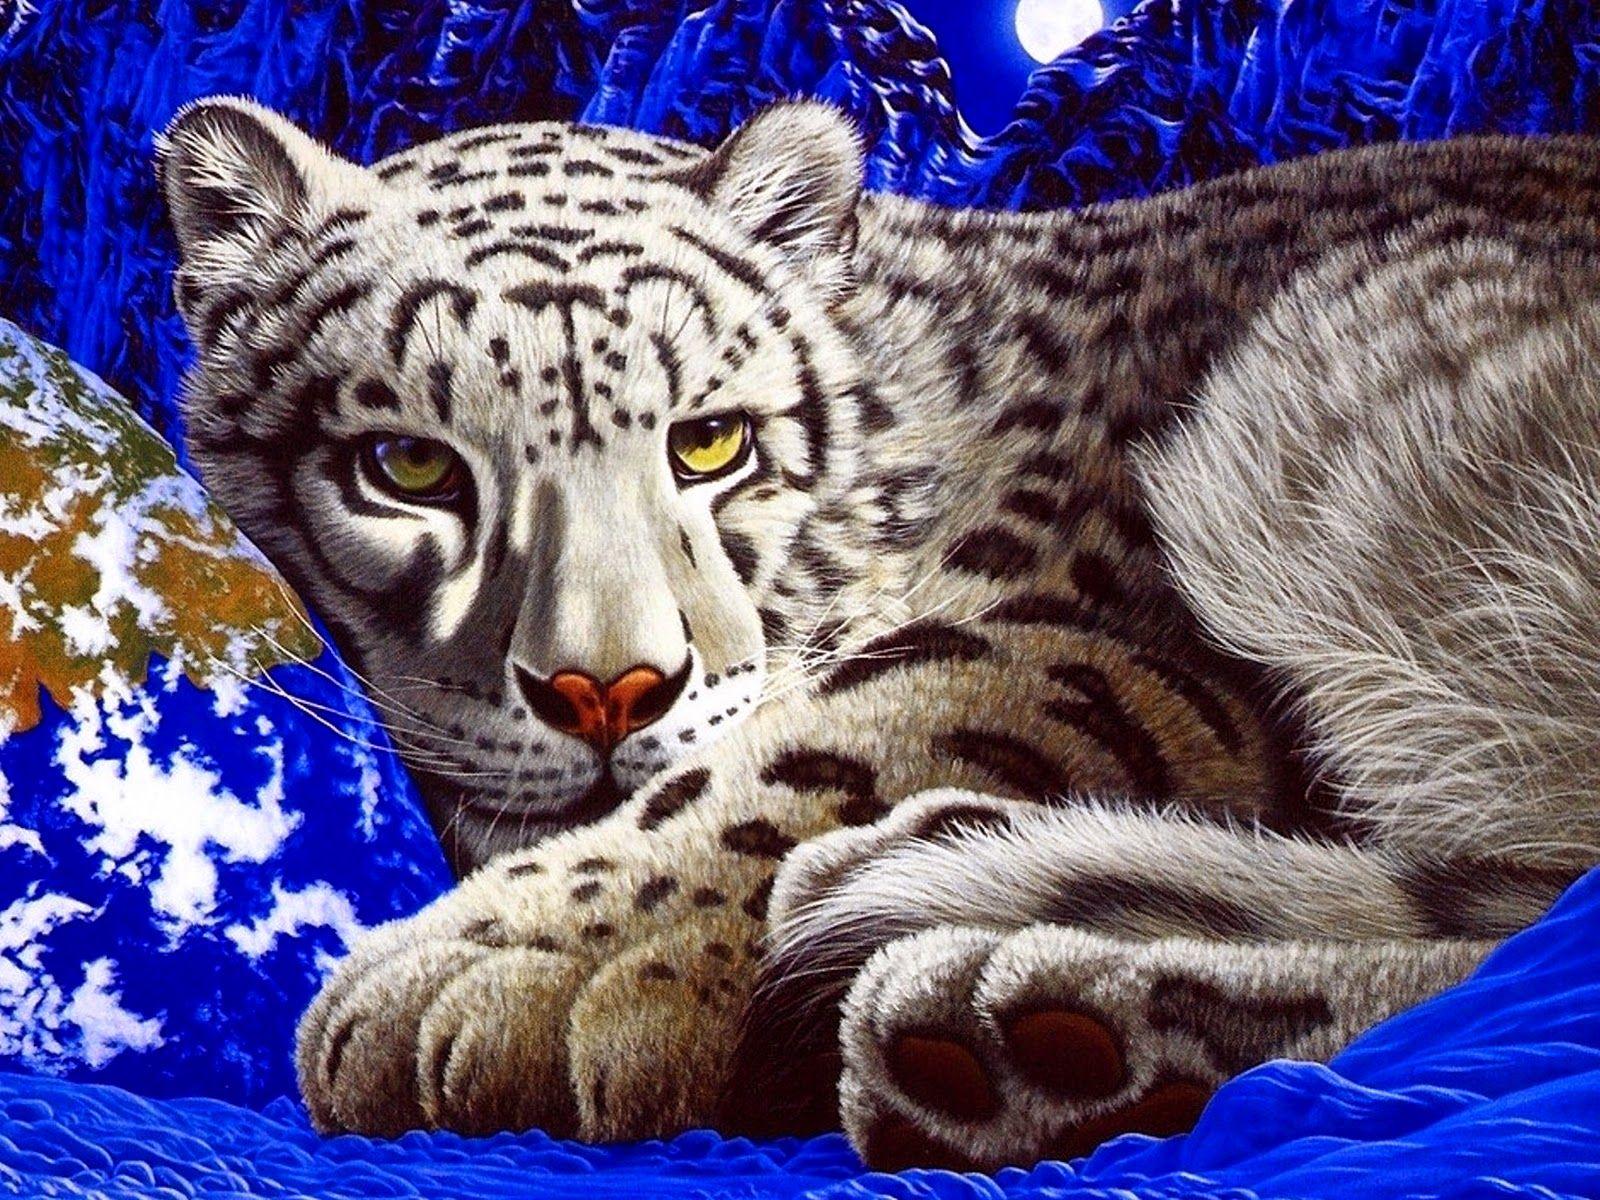 3d Cheetah Amazing Art Wallpaper Wallpapersxplore Free Hd Desktop Wallpapers Animals Beautiful Animals Pet Tiger